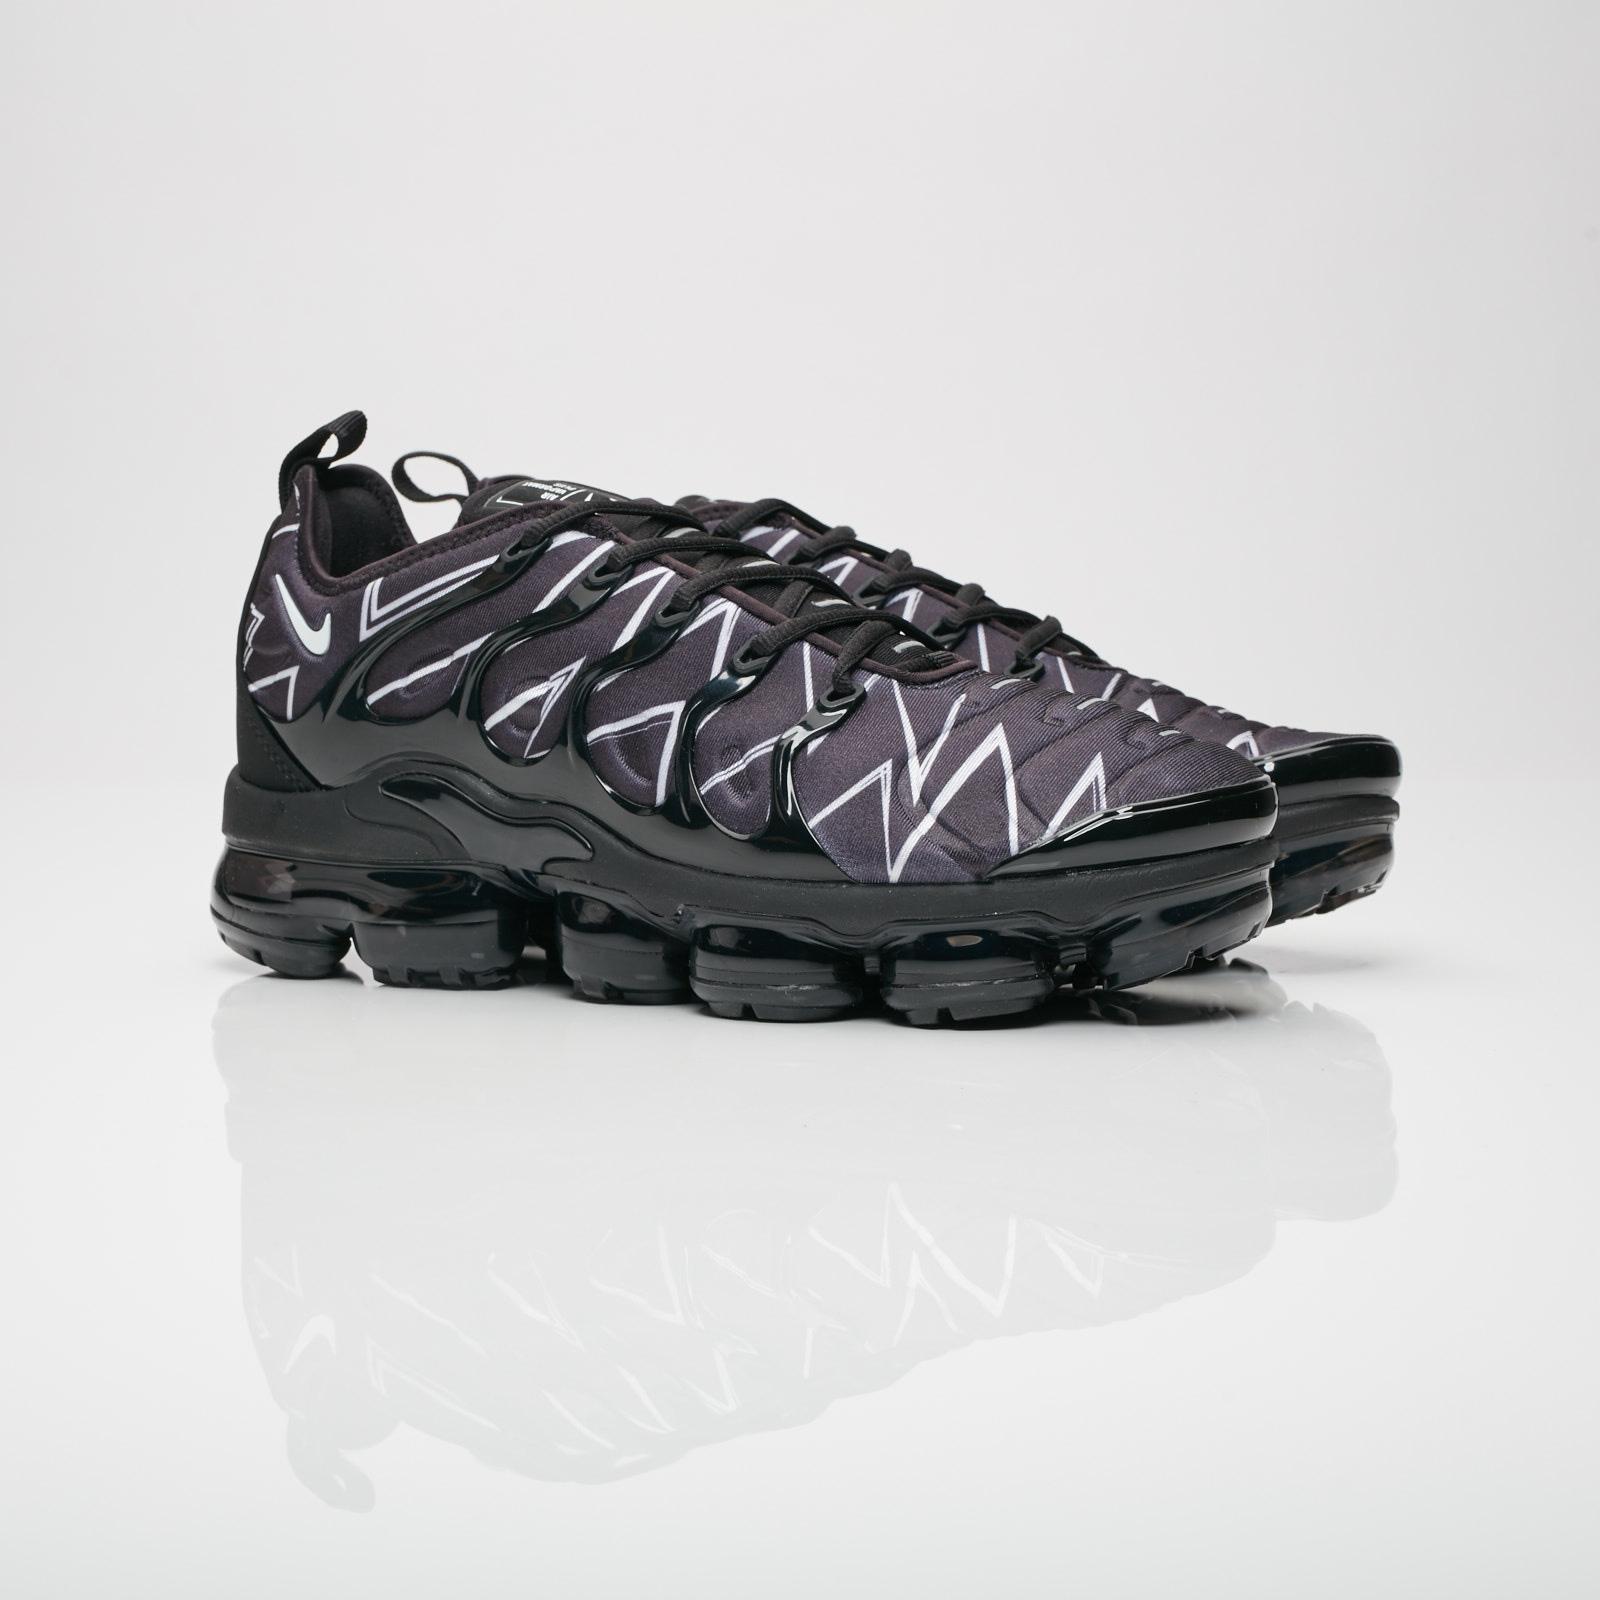 4f33422e673d0 Nike Air Vapormax Plus HL - Aj6312-001 - Sneakersnstuff